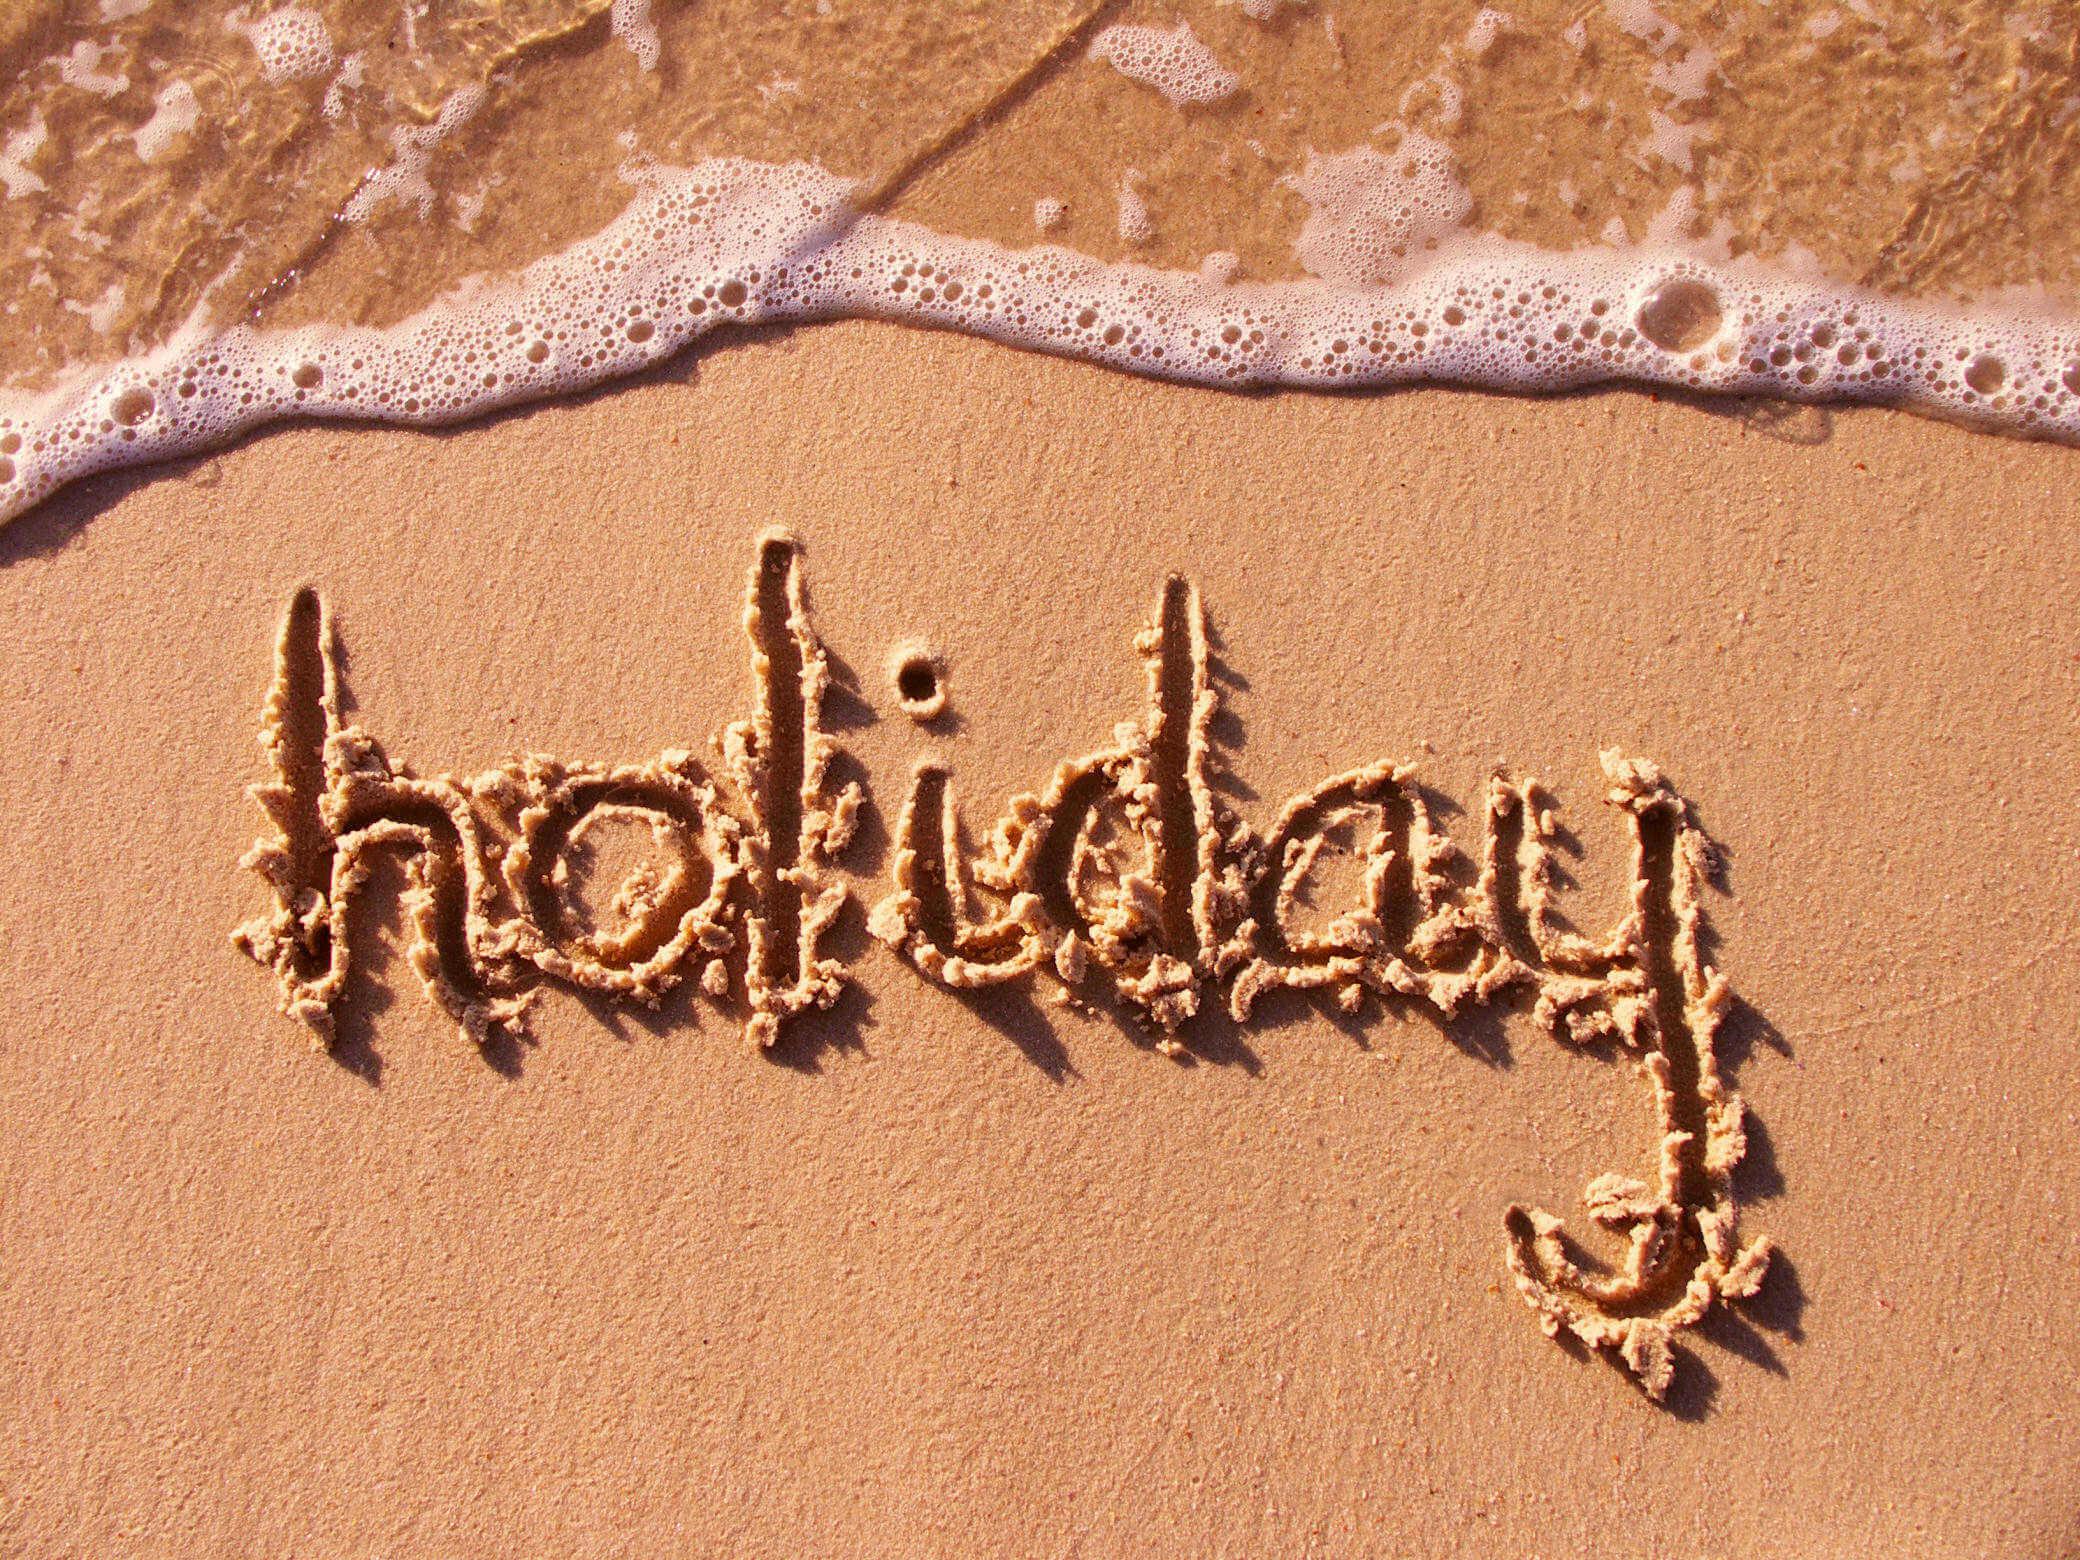 De goedkoopste vakanties vindt u op BoekLastminute.com